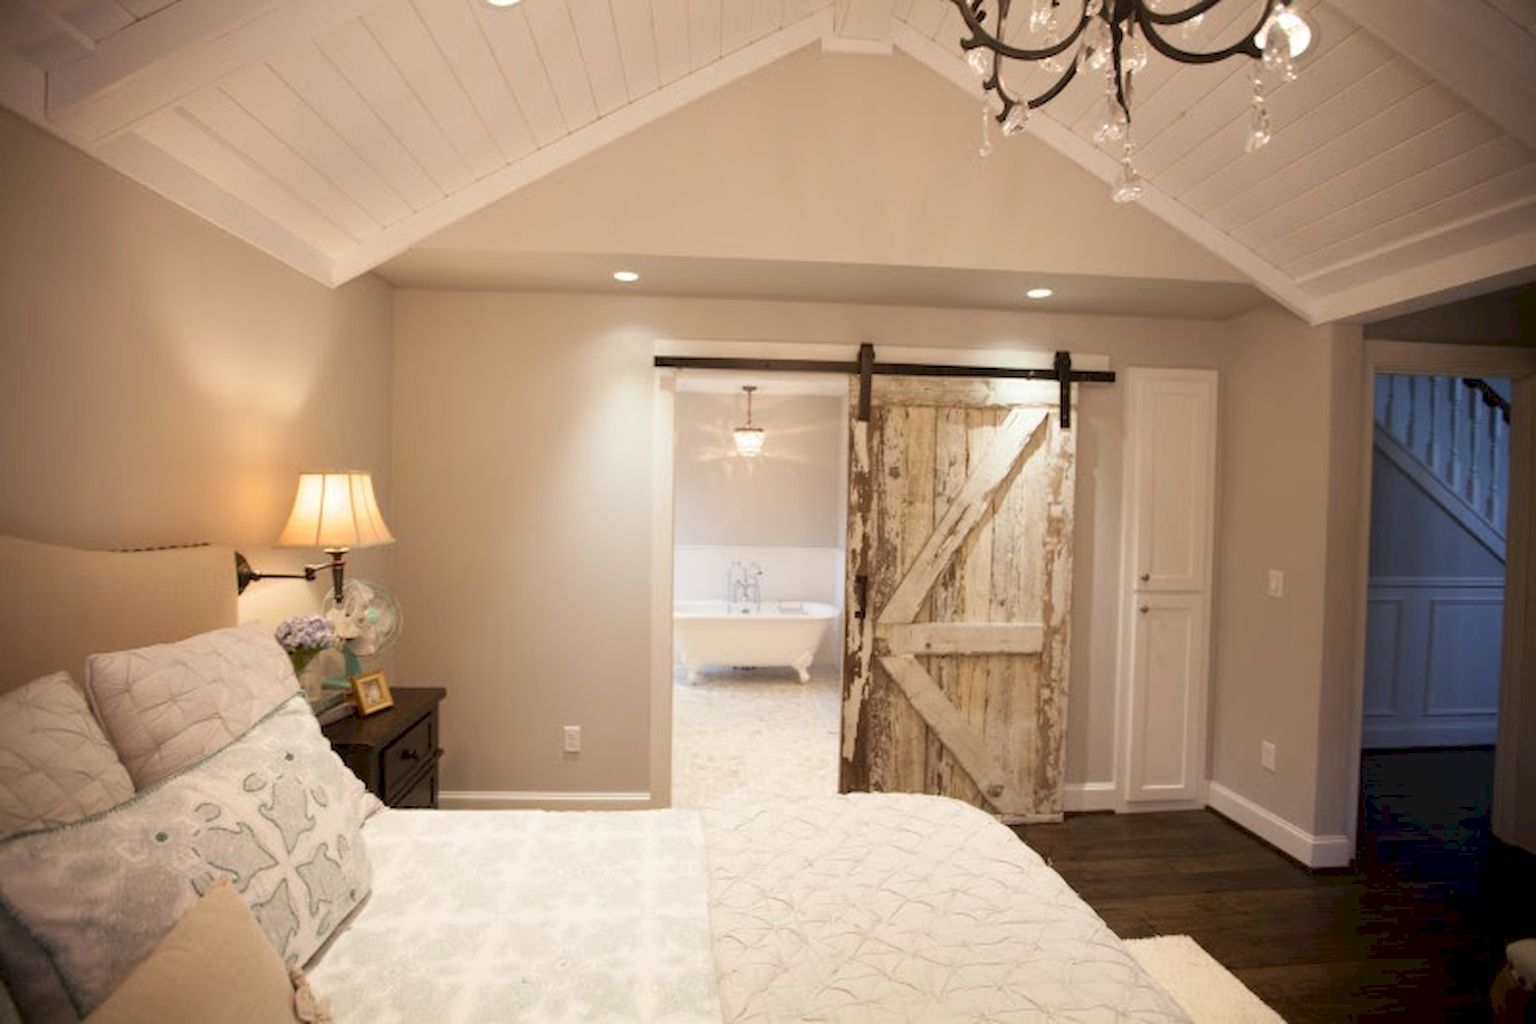 Cheap Master Bedroom Ideas Brilliant 51 Rustic Farmhouse Style Master Bedroom Ideas  Rustic Farmhouse Design Inspiration